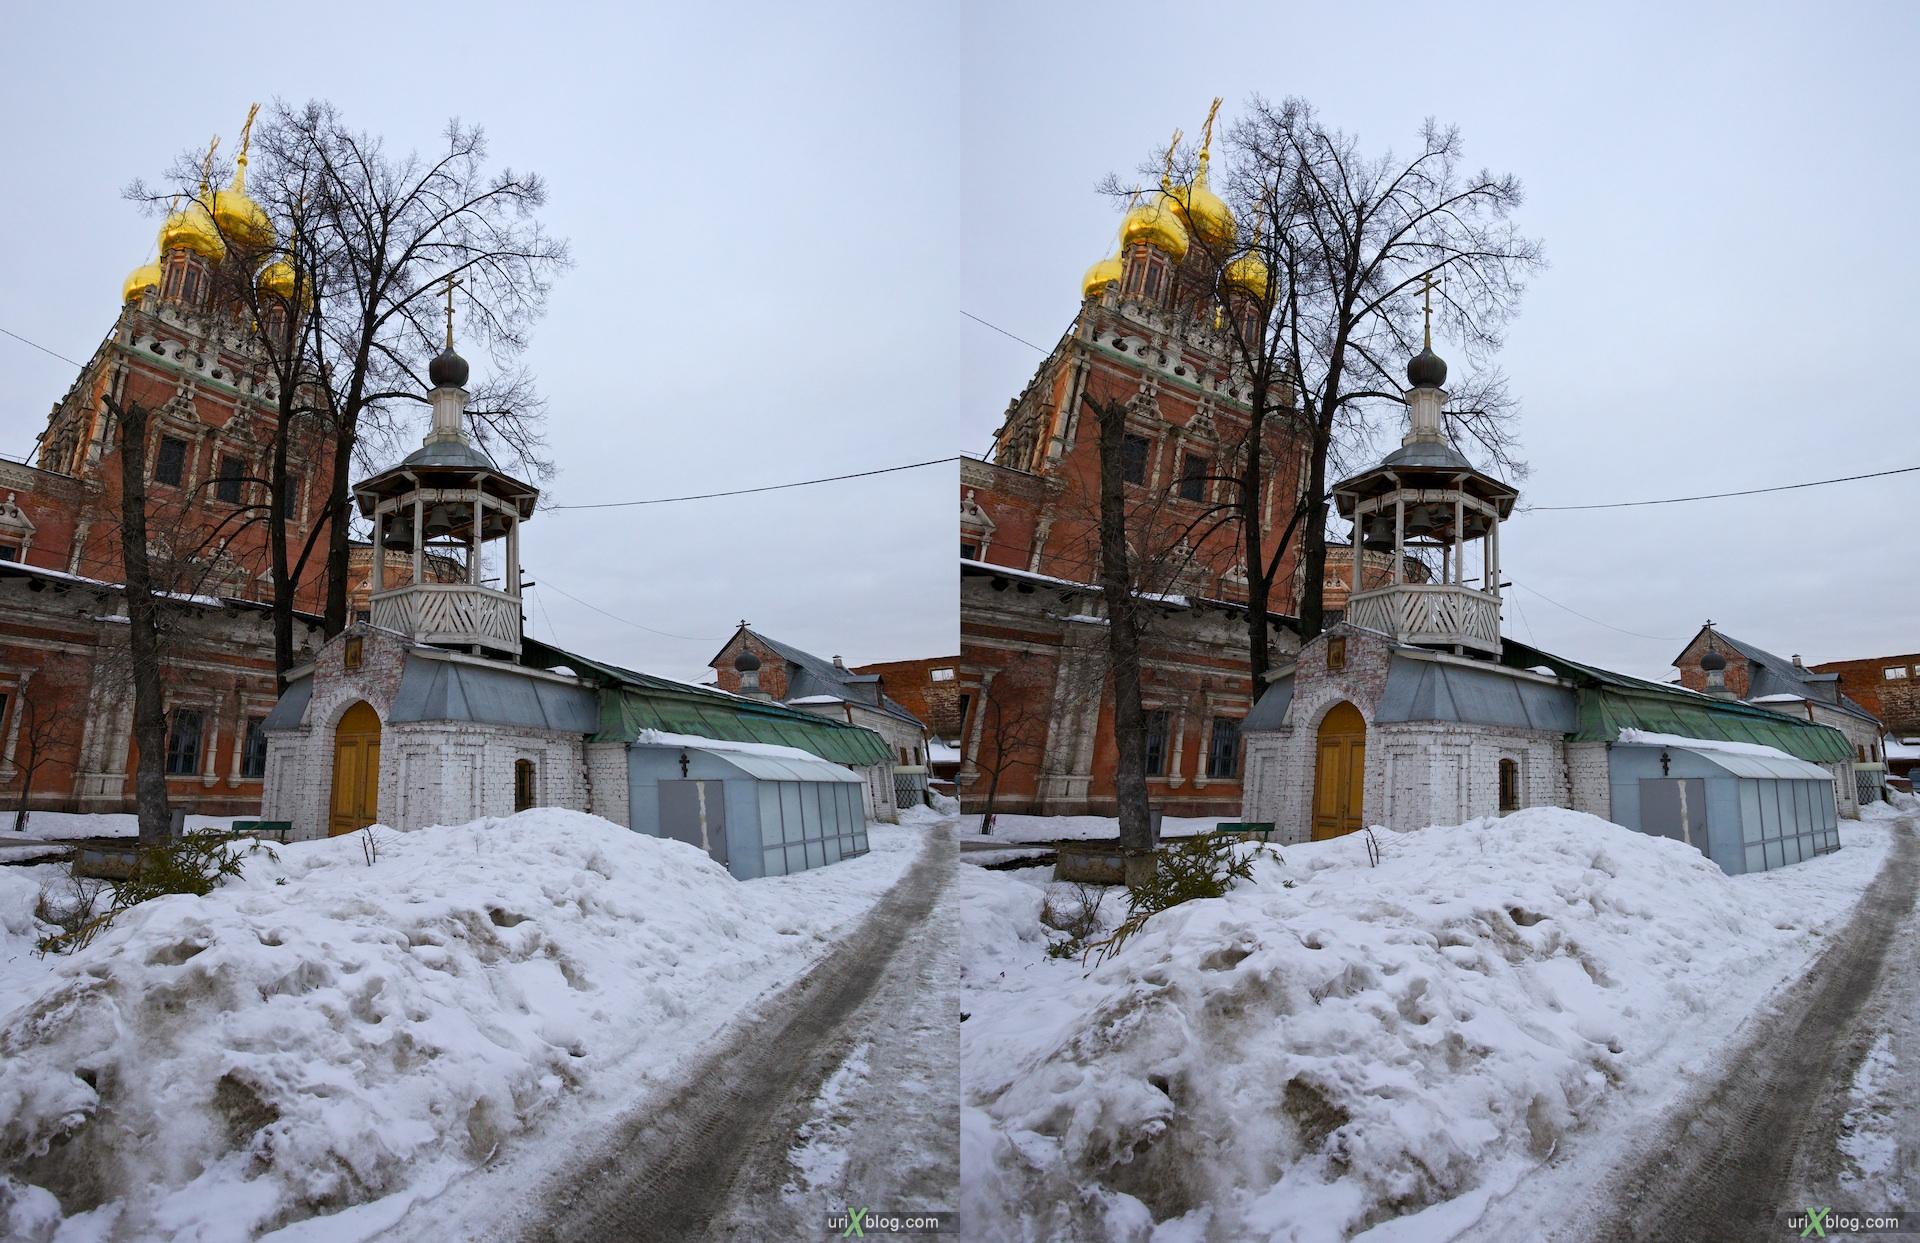 2011 церковь в Кадашах, храм в Кадашах, Kadashi Church, Храм преподобного Иова Почаевского, 3D, стерео, stereo